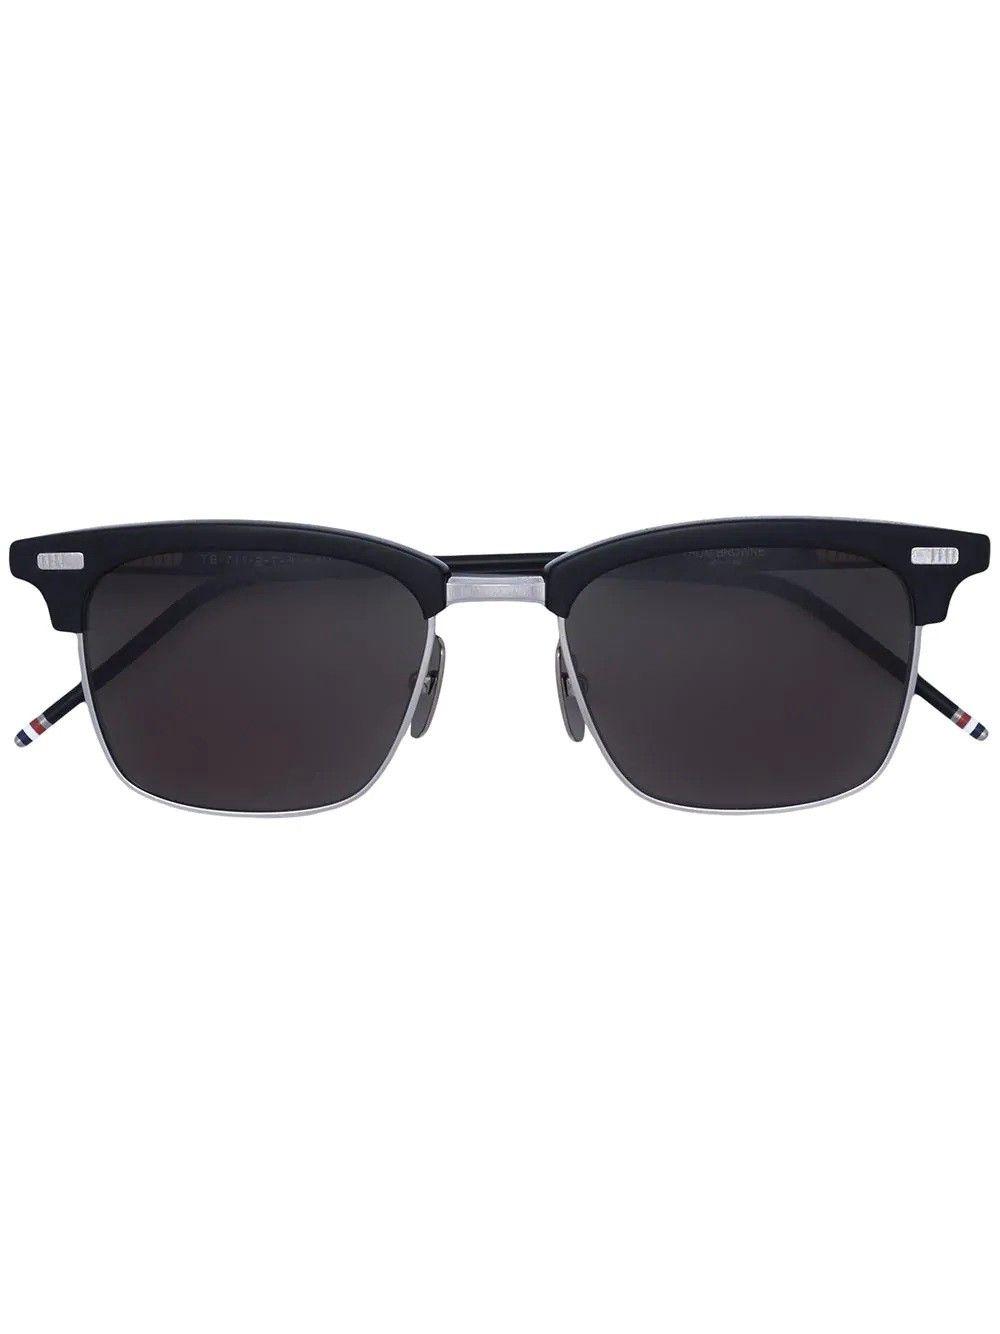 Thom Browne. Black Square Frame Sunglasses | Products | Pinterest ...